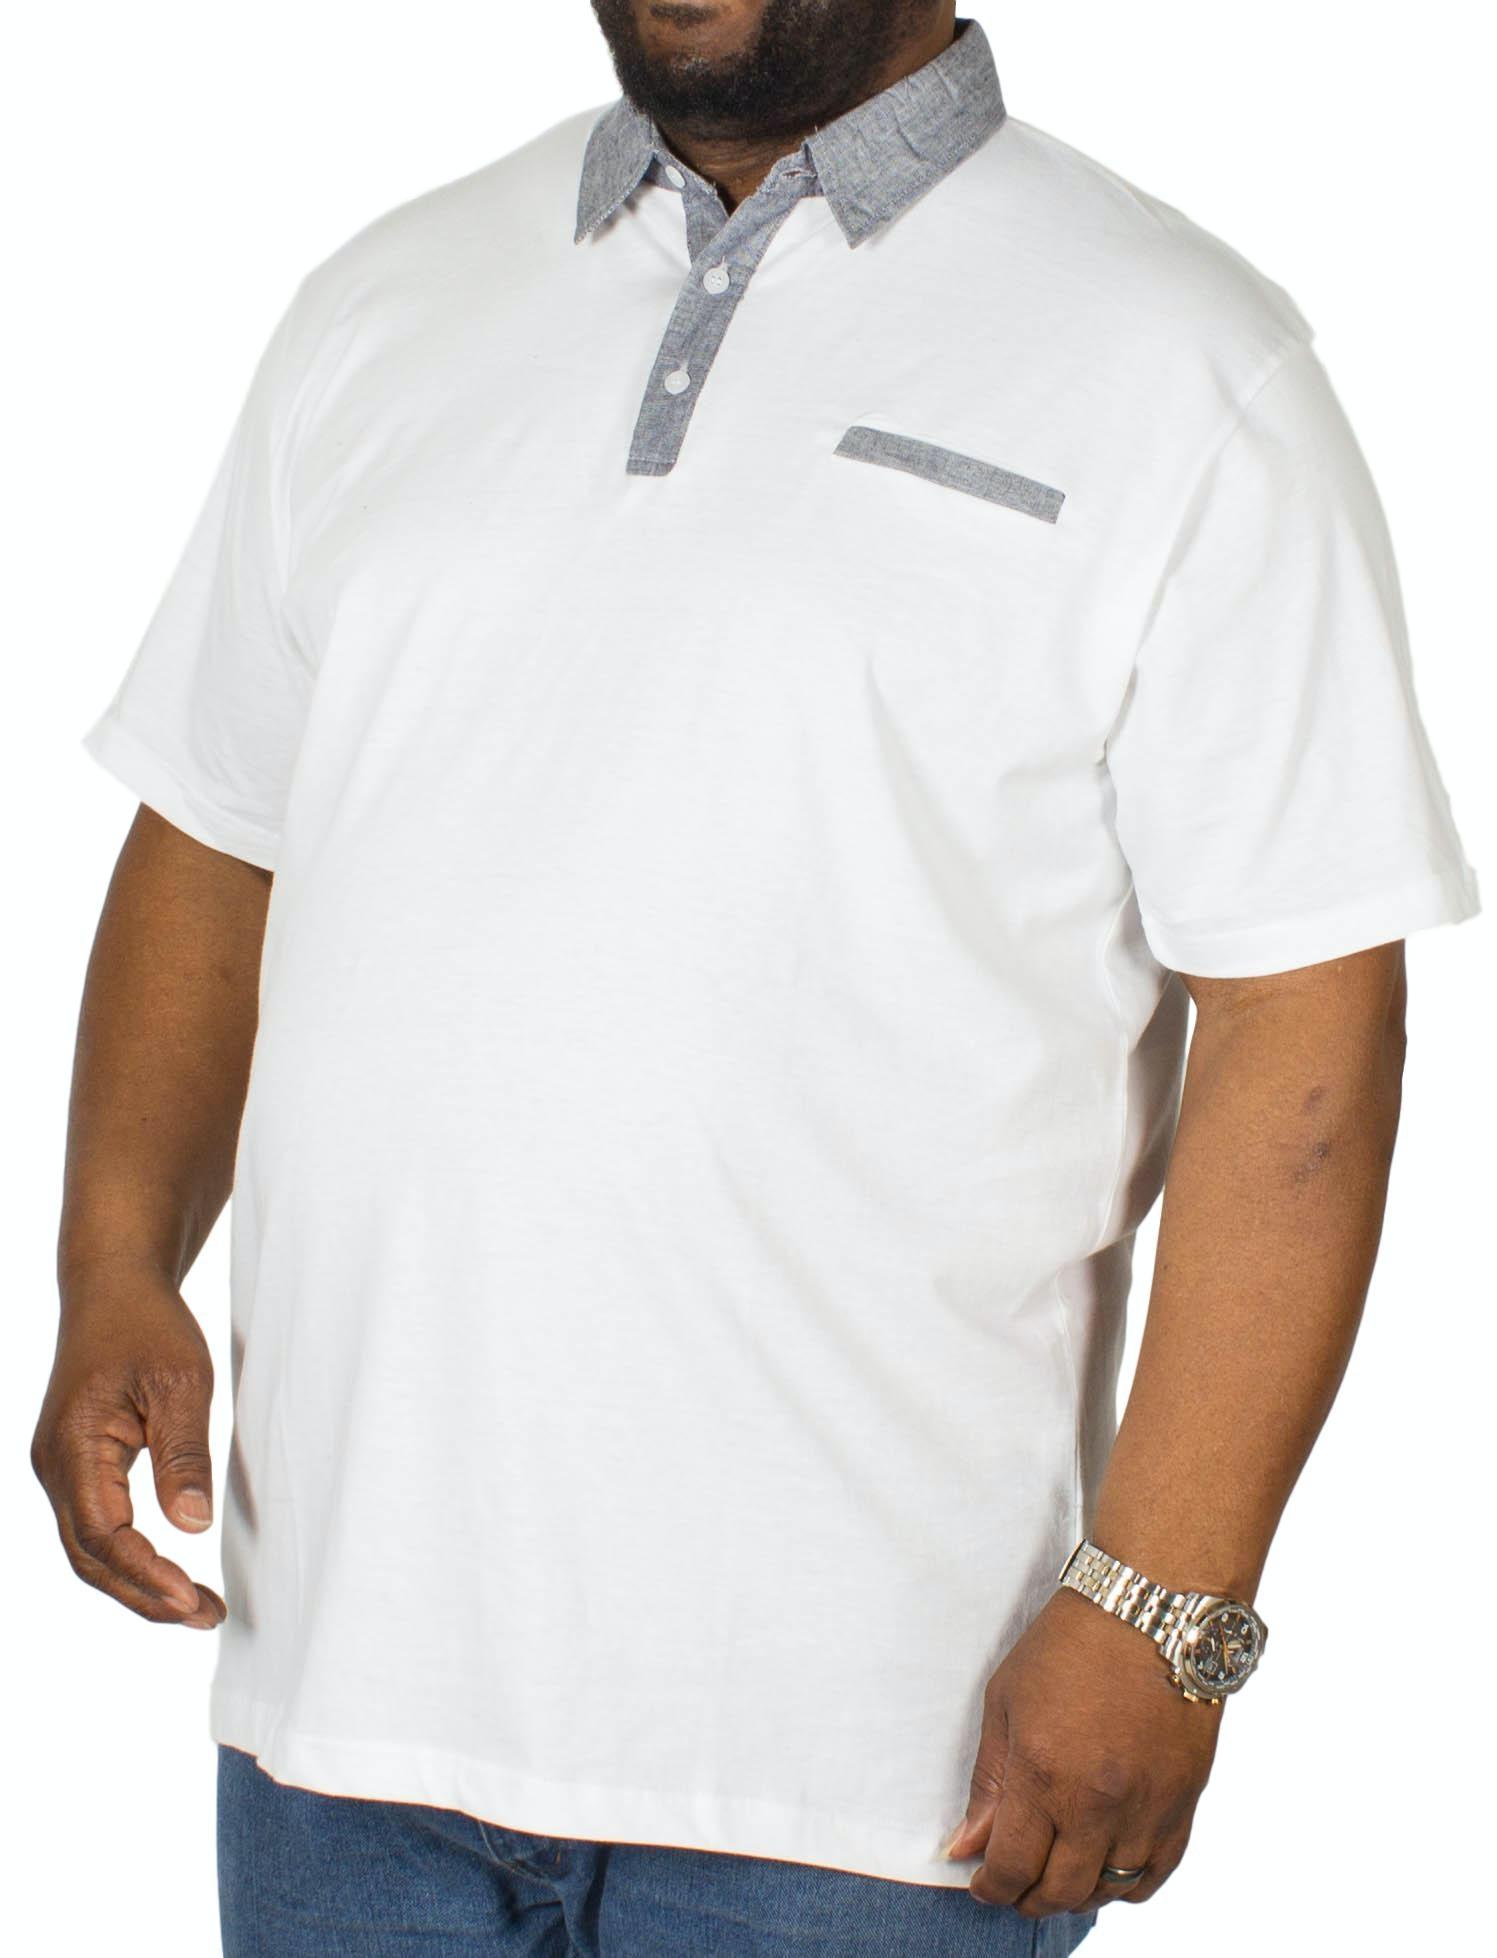 Bigdude Contrast Jersey Polo Shirt White